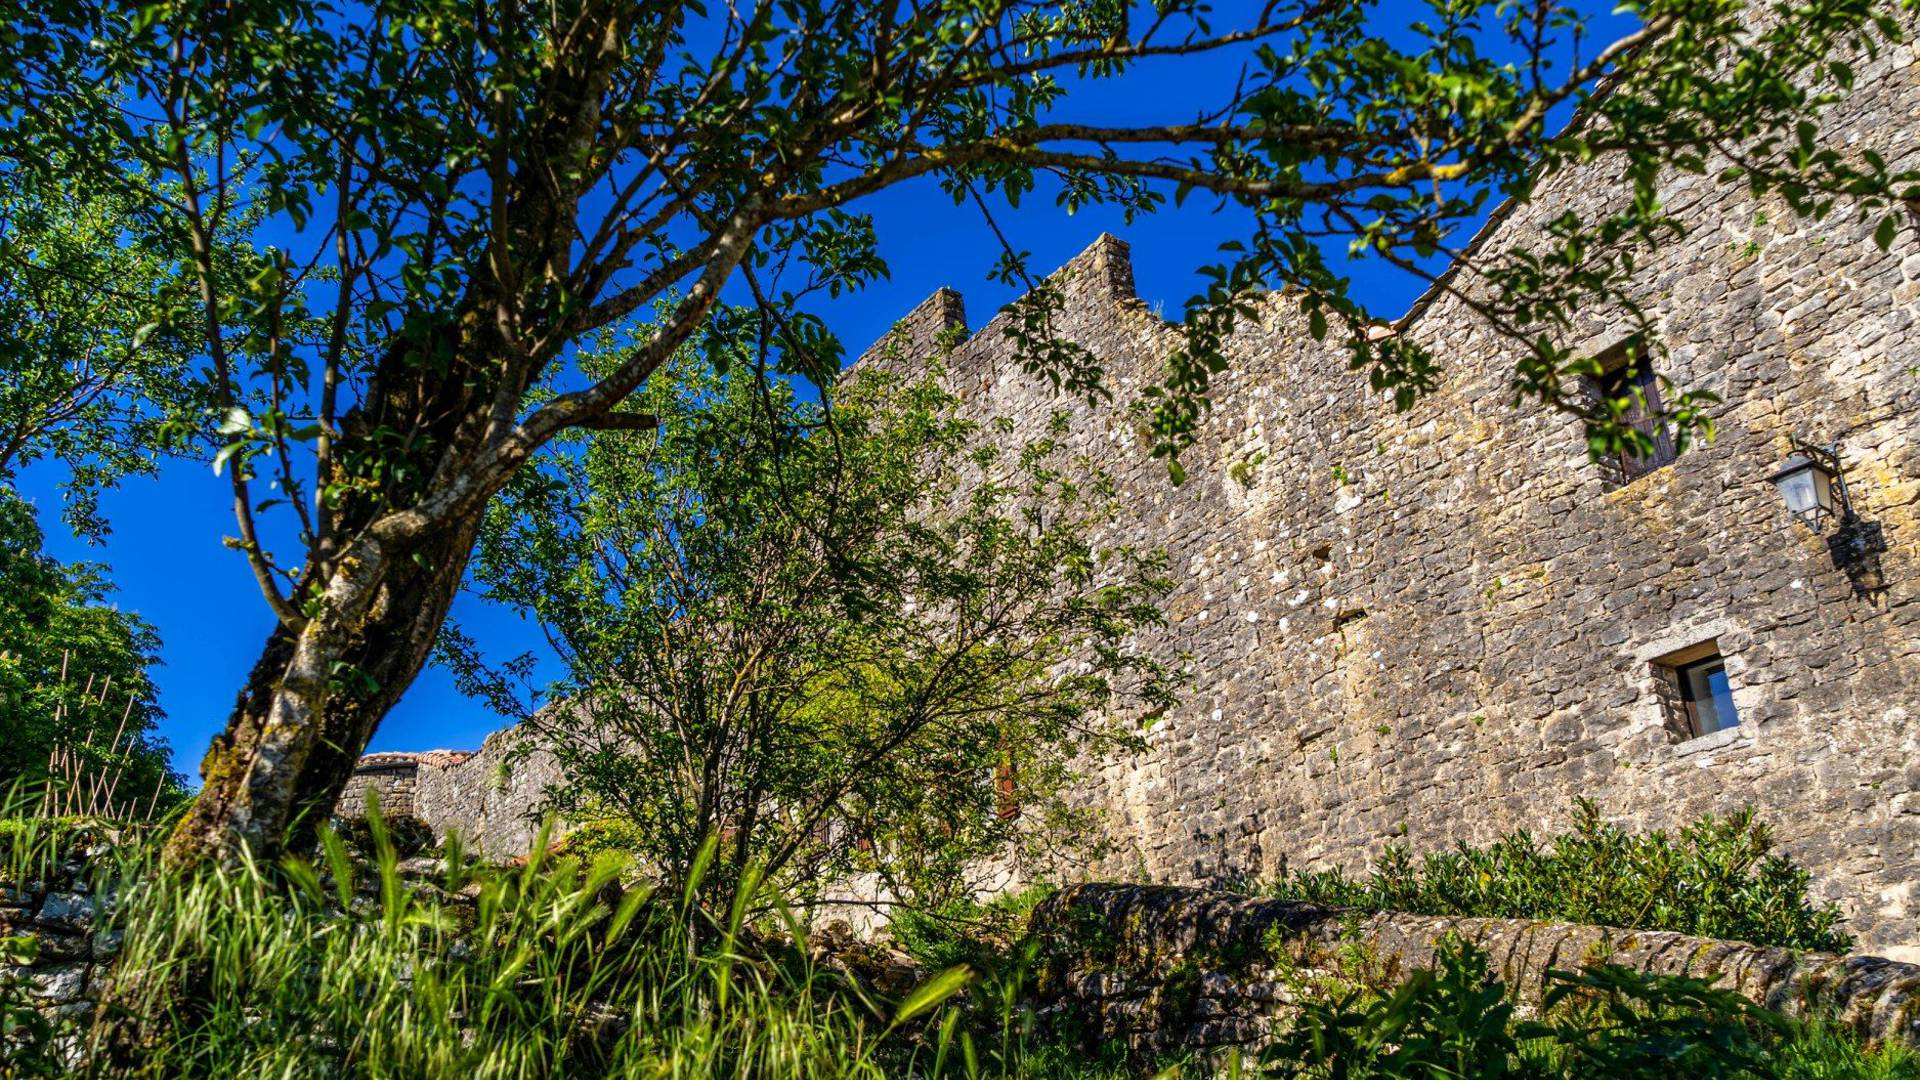 Fort de Saint Jean d'Alcas - Circuit Templier Hospitalier du Larzac - Aveyron